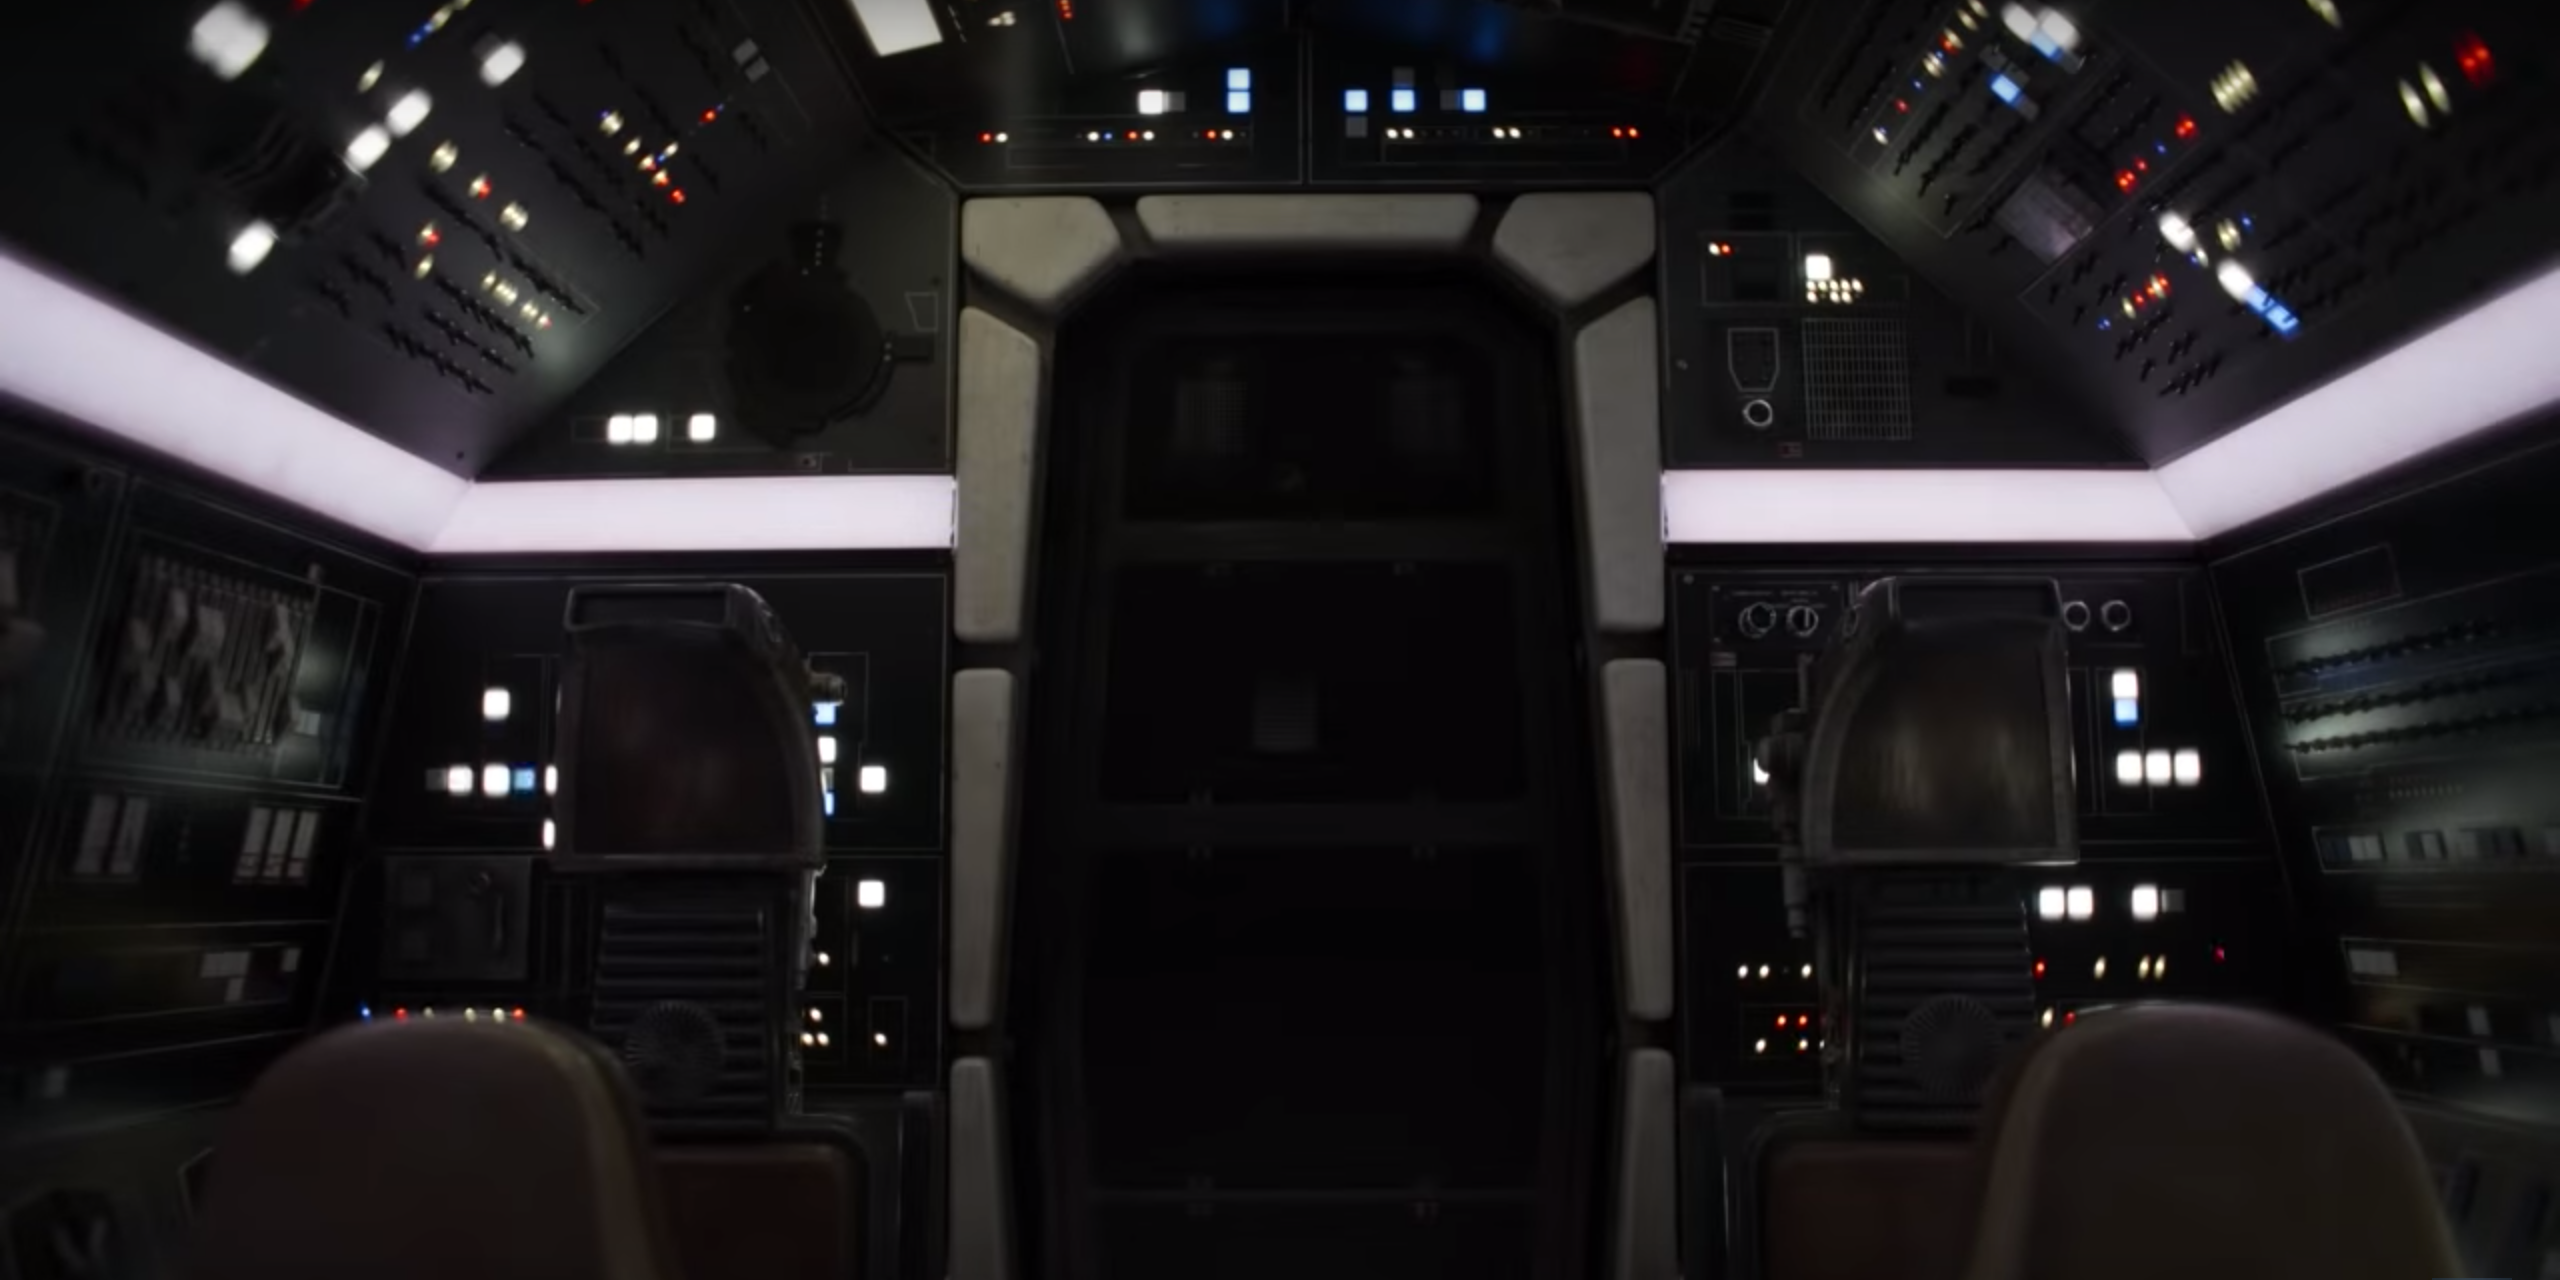 Disney Gives Sneak Peek at New Star Wars: Galaxy's Edge Rides